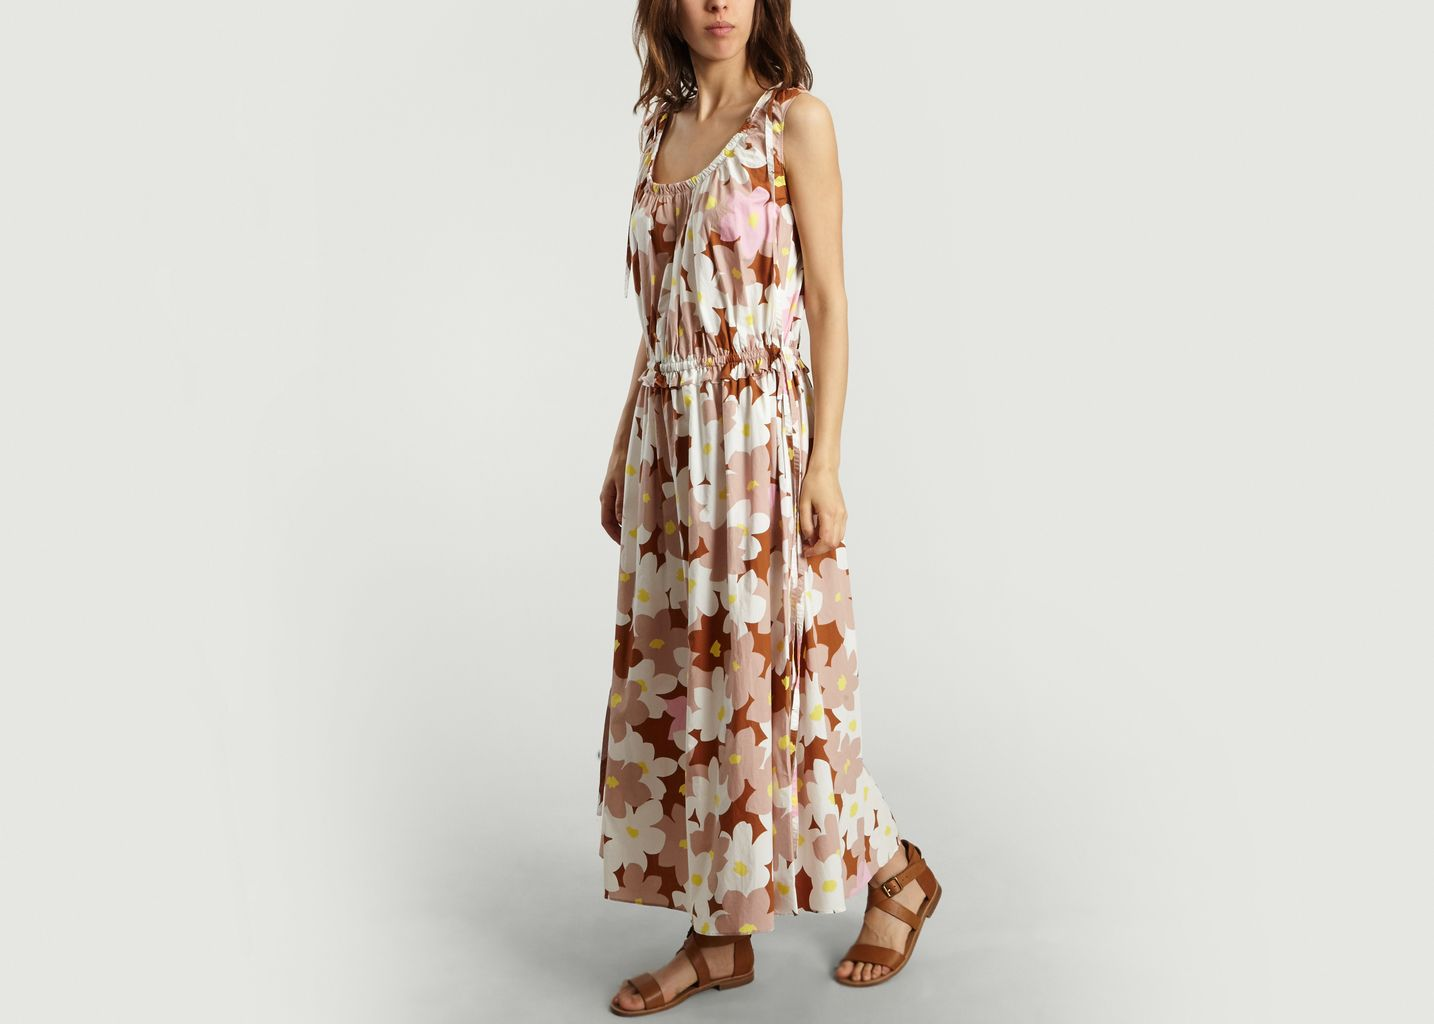 Robe Imprimé Floral - Kenzo